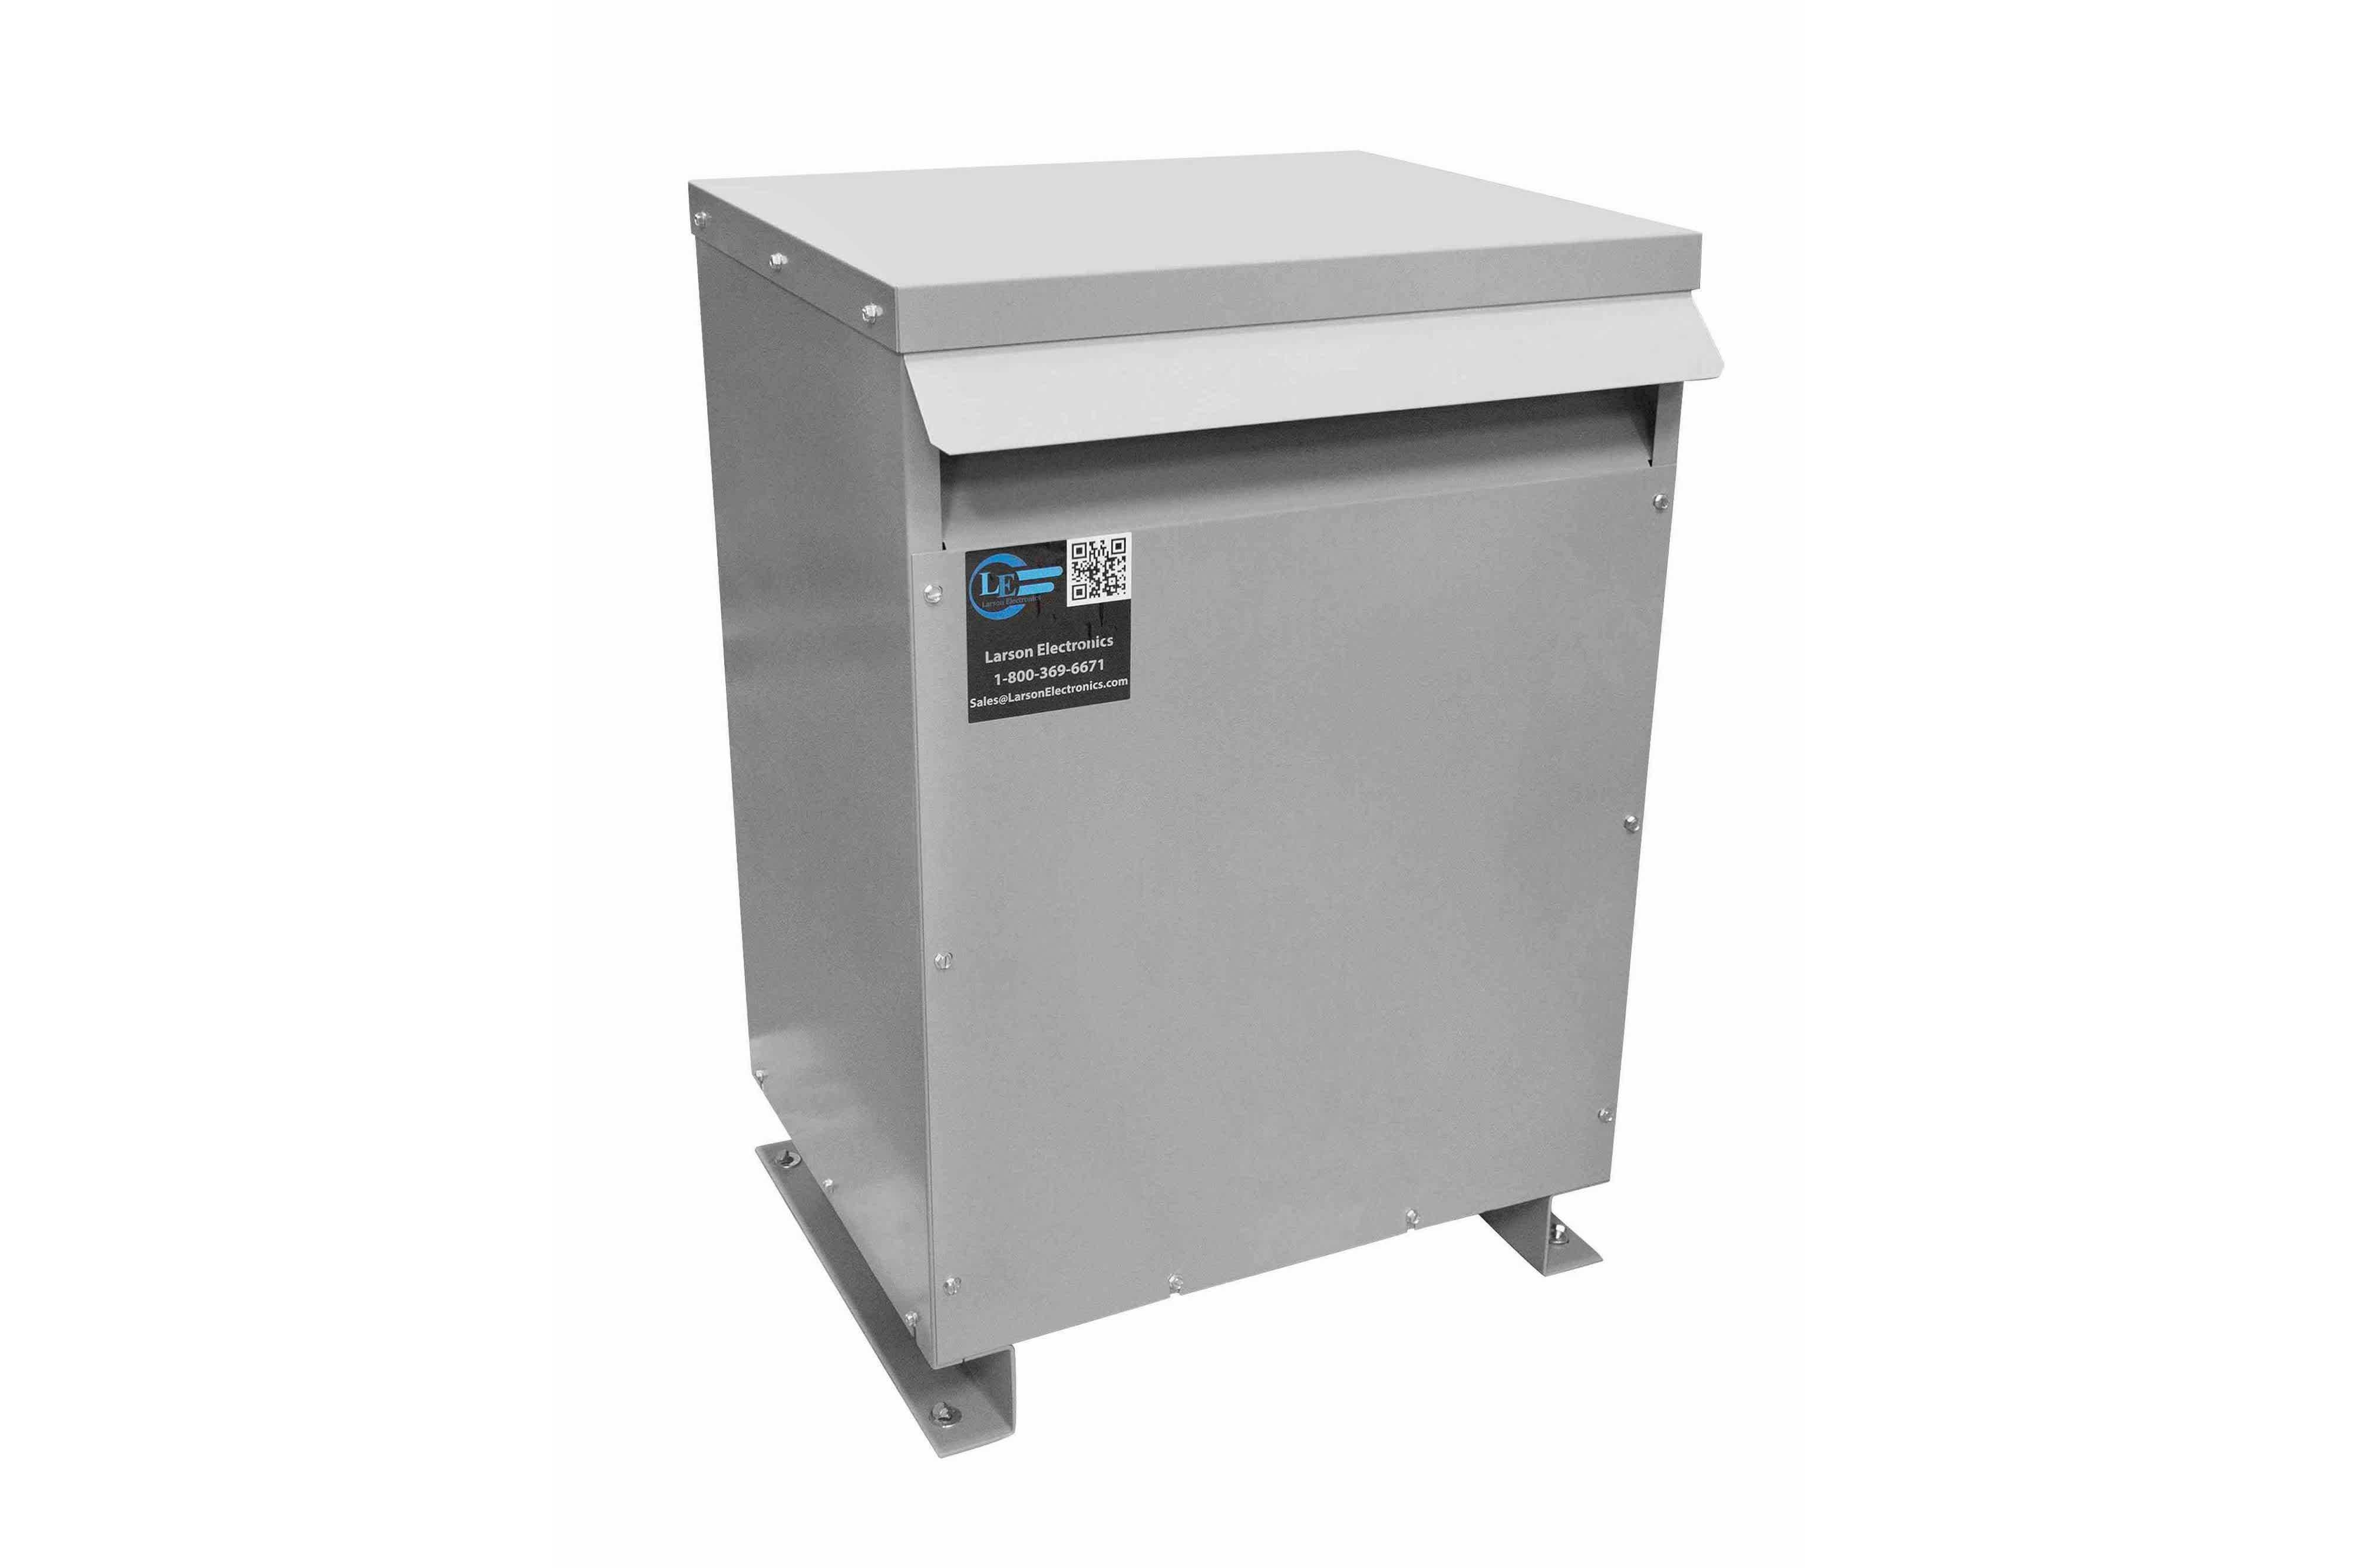 14 kVA 3PH Isolation Transformer, 440V Wye Primary, 208V Delta Secondary, N3R, Ventilated, 60 Hz